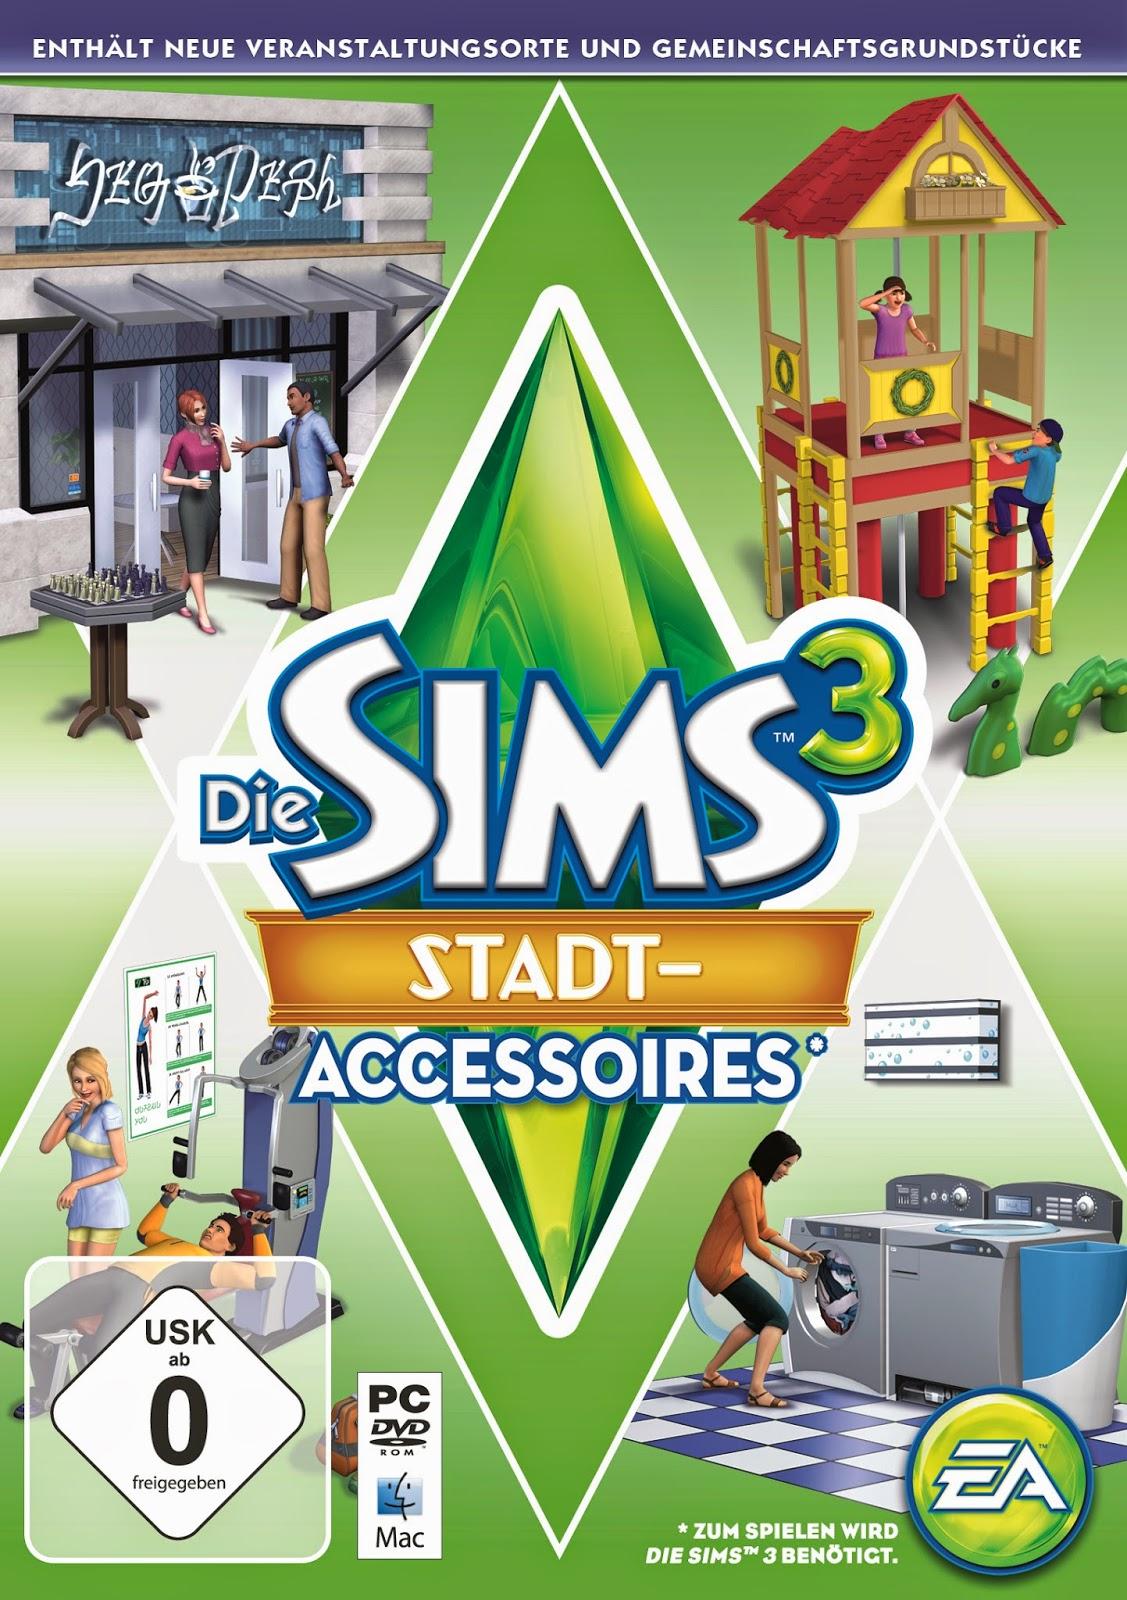 http://www.amazon.de/Die-Sims-Stadt-Accessoires-Online-Code/dp/B007LTOR16/ref=sr_1_1?ie=UTF8&qid=1406036292&sr=8-1&keywords=Die+Sims+3+-+Stadt-Accessoires